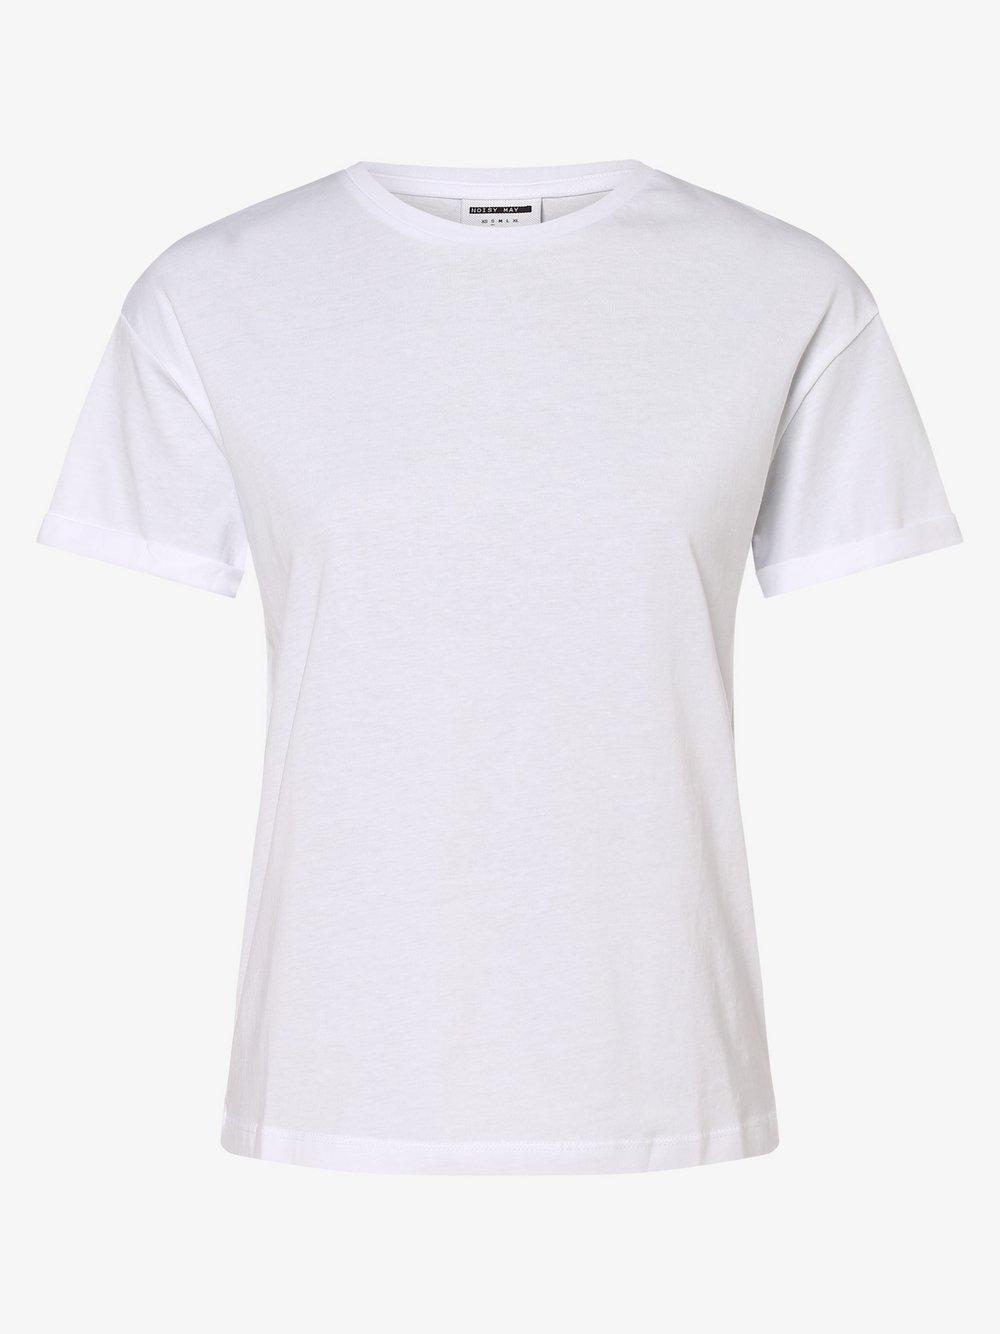 Noisy May - T-shirt damski – Nmbrandy, biały